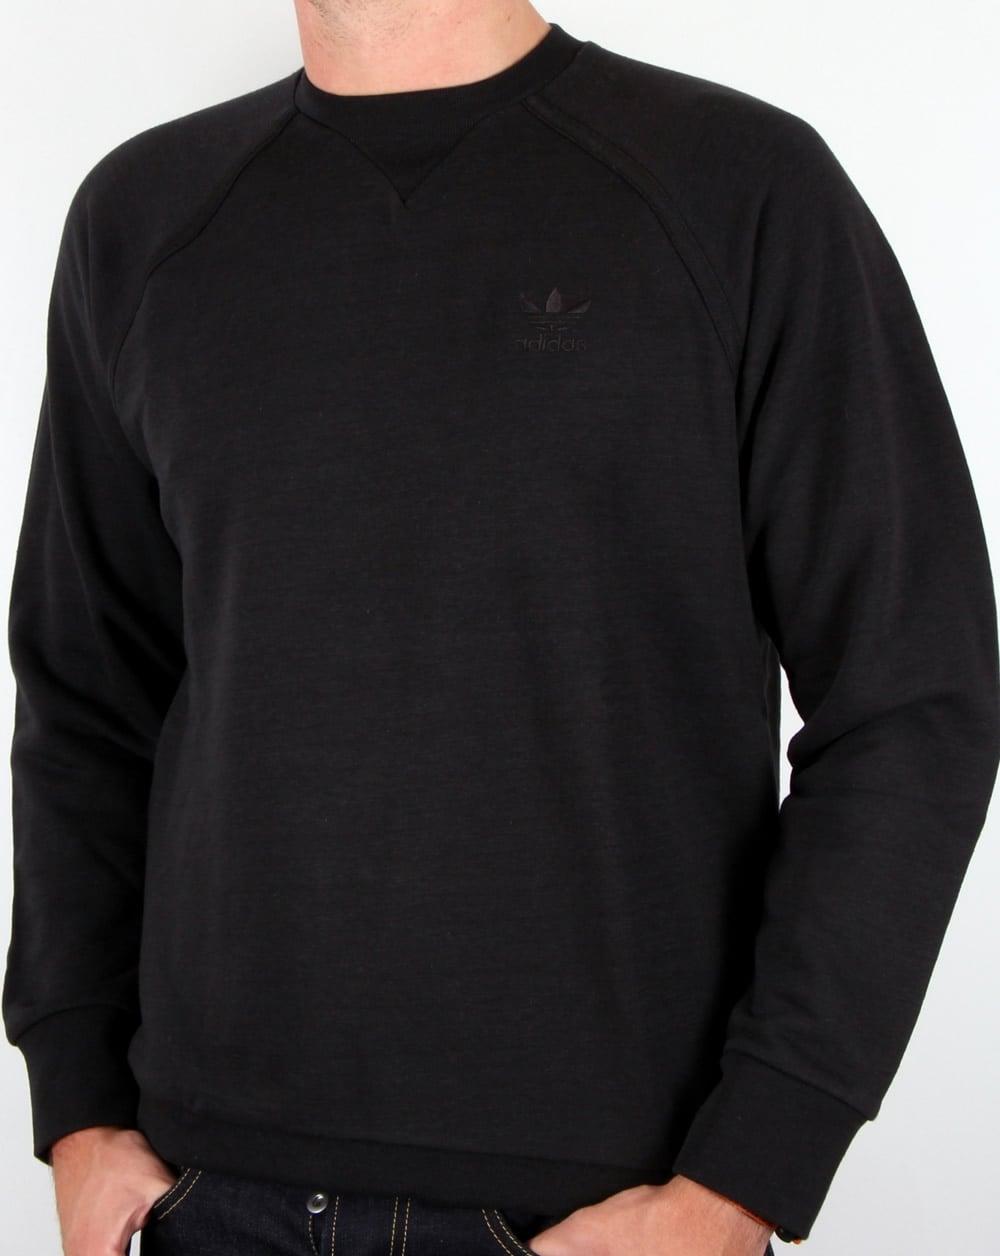 c31ba343a6e adidas Originals Adidas Originals Premium Sweatshirt Black